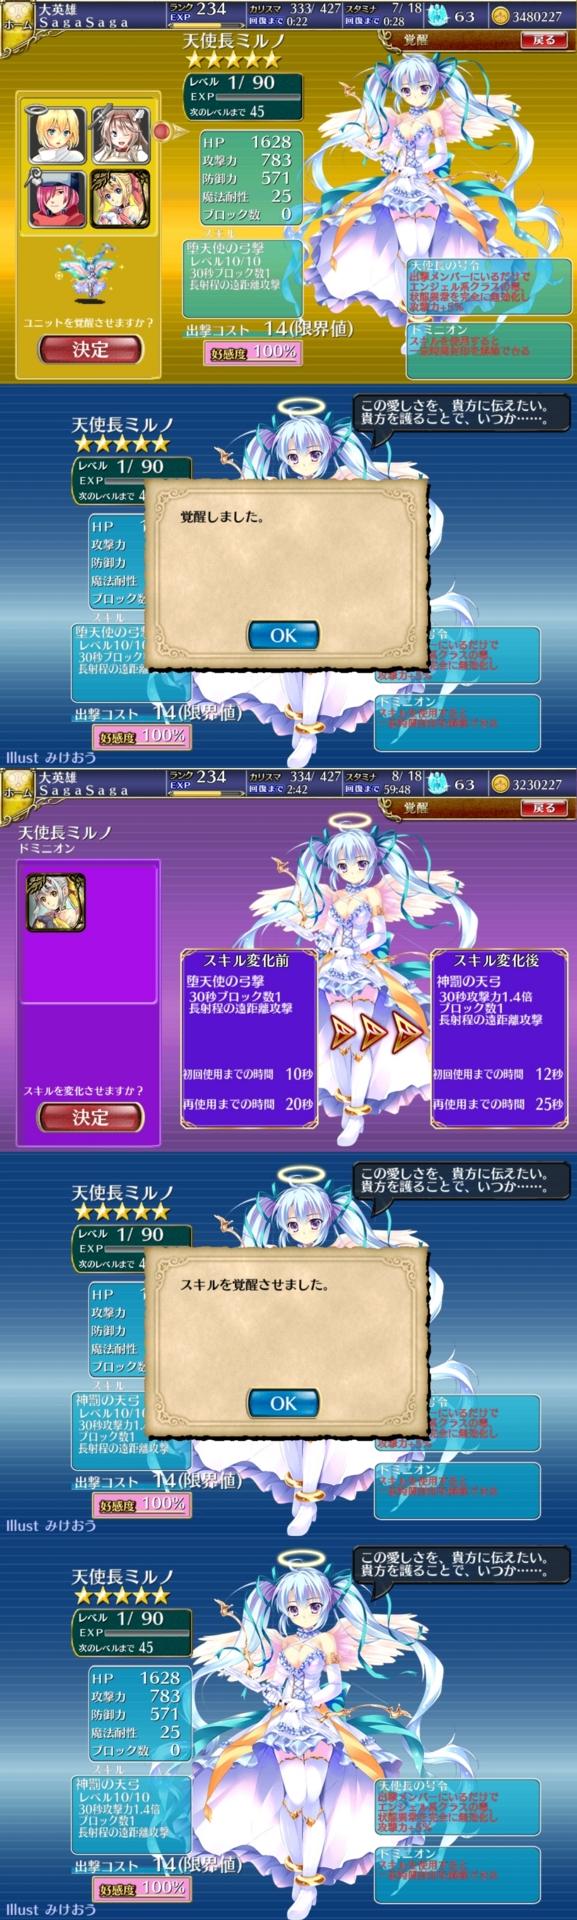 f:id:himajin-mode:20160625202951j:plain